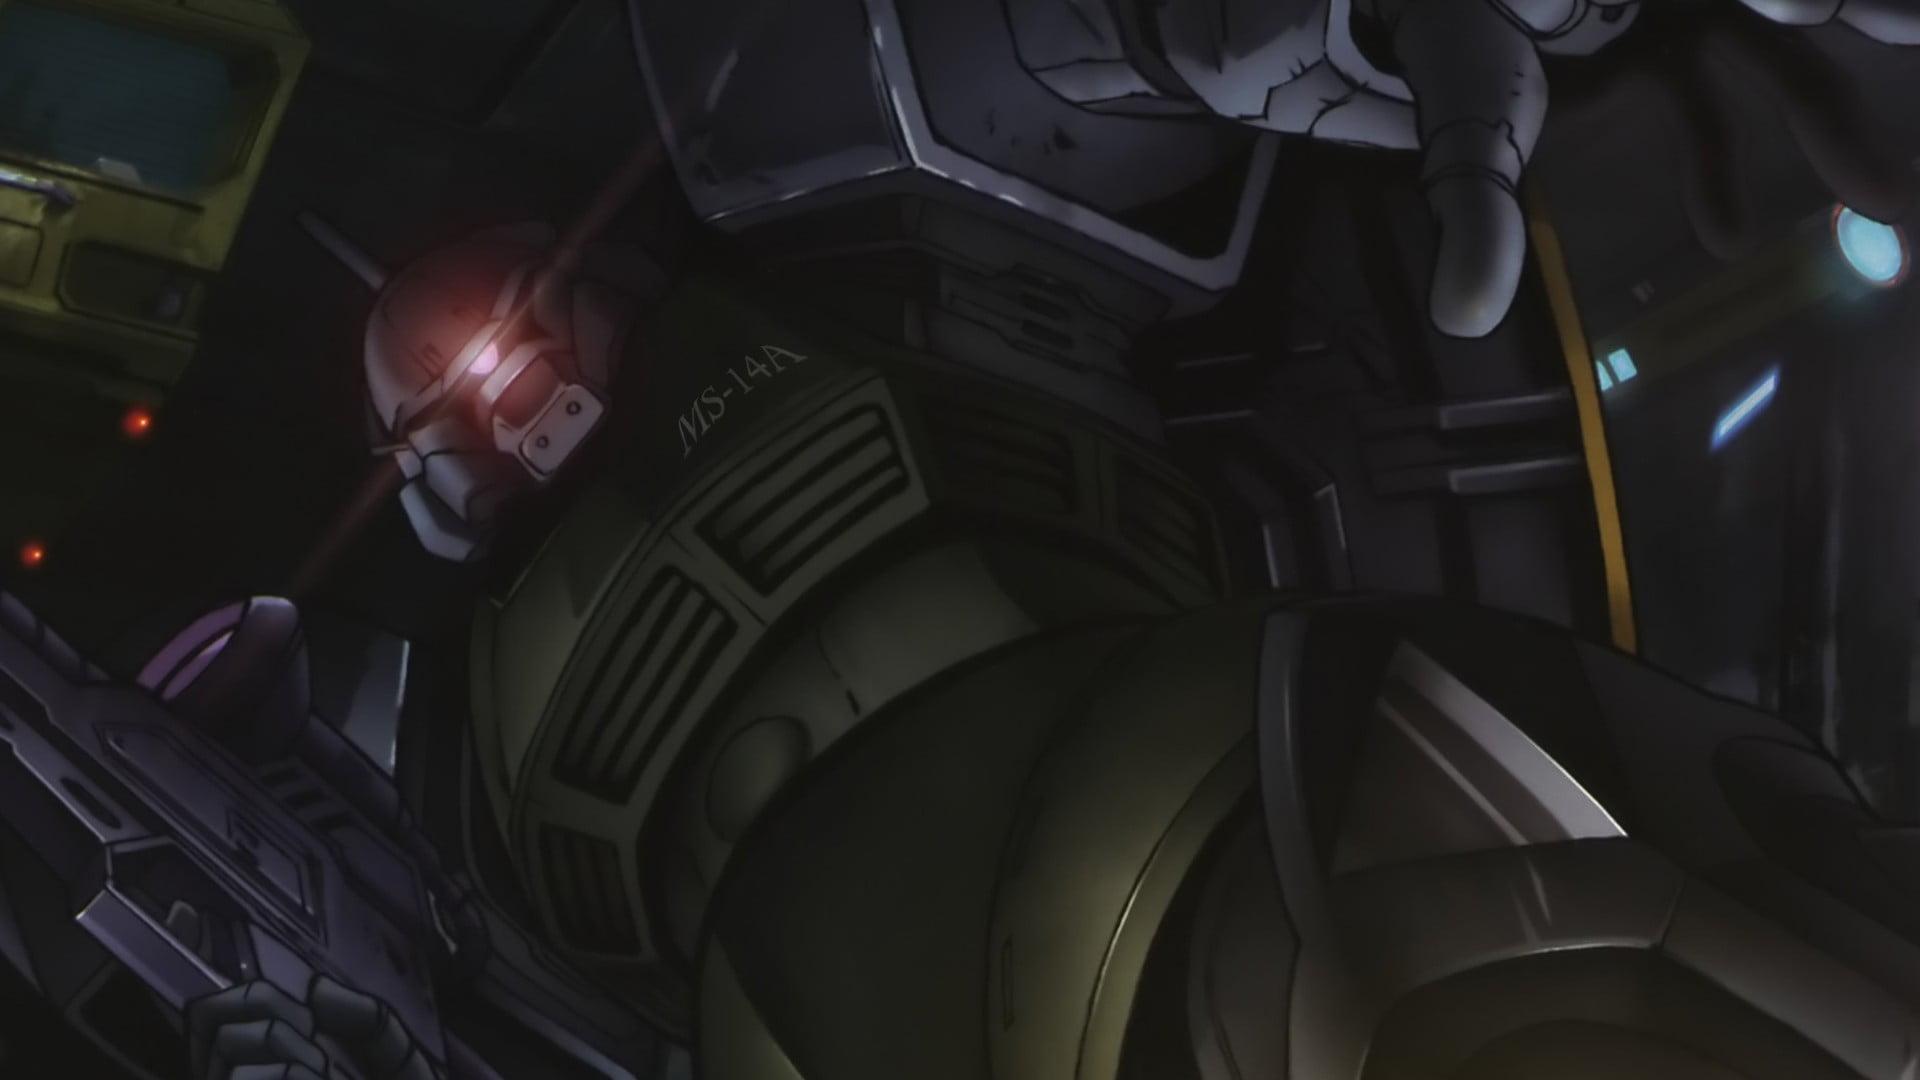 Robot artwork Gelgoog Mobile Suit Gundam HD wallpaper 1920x1080